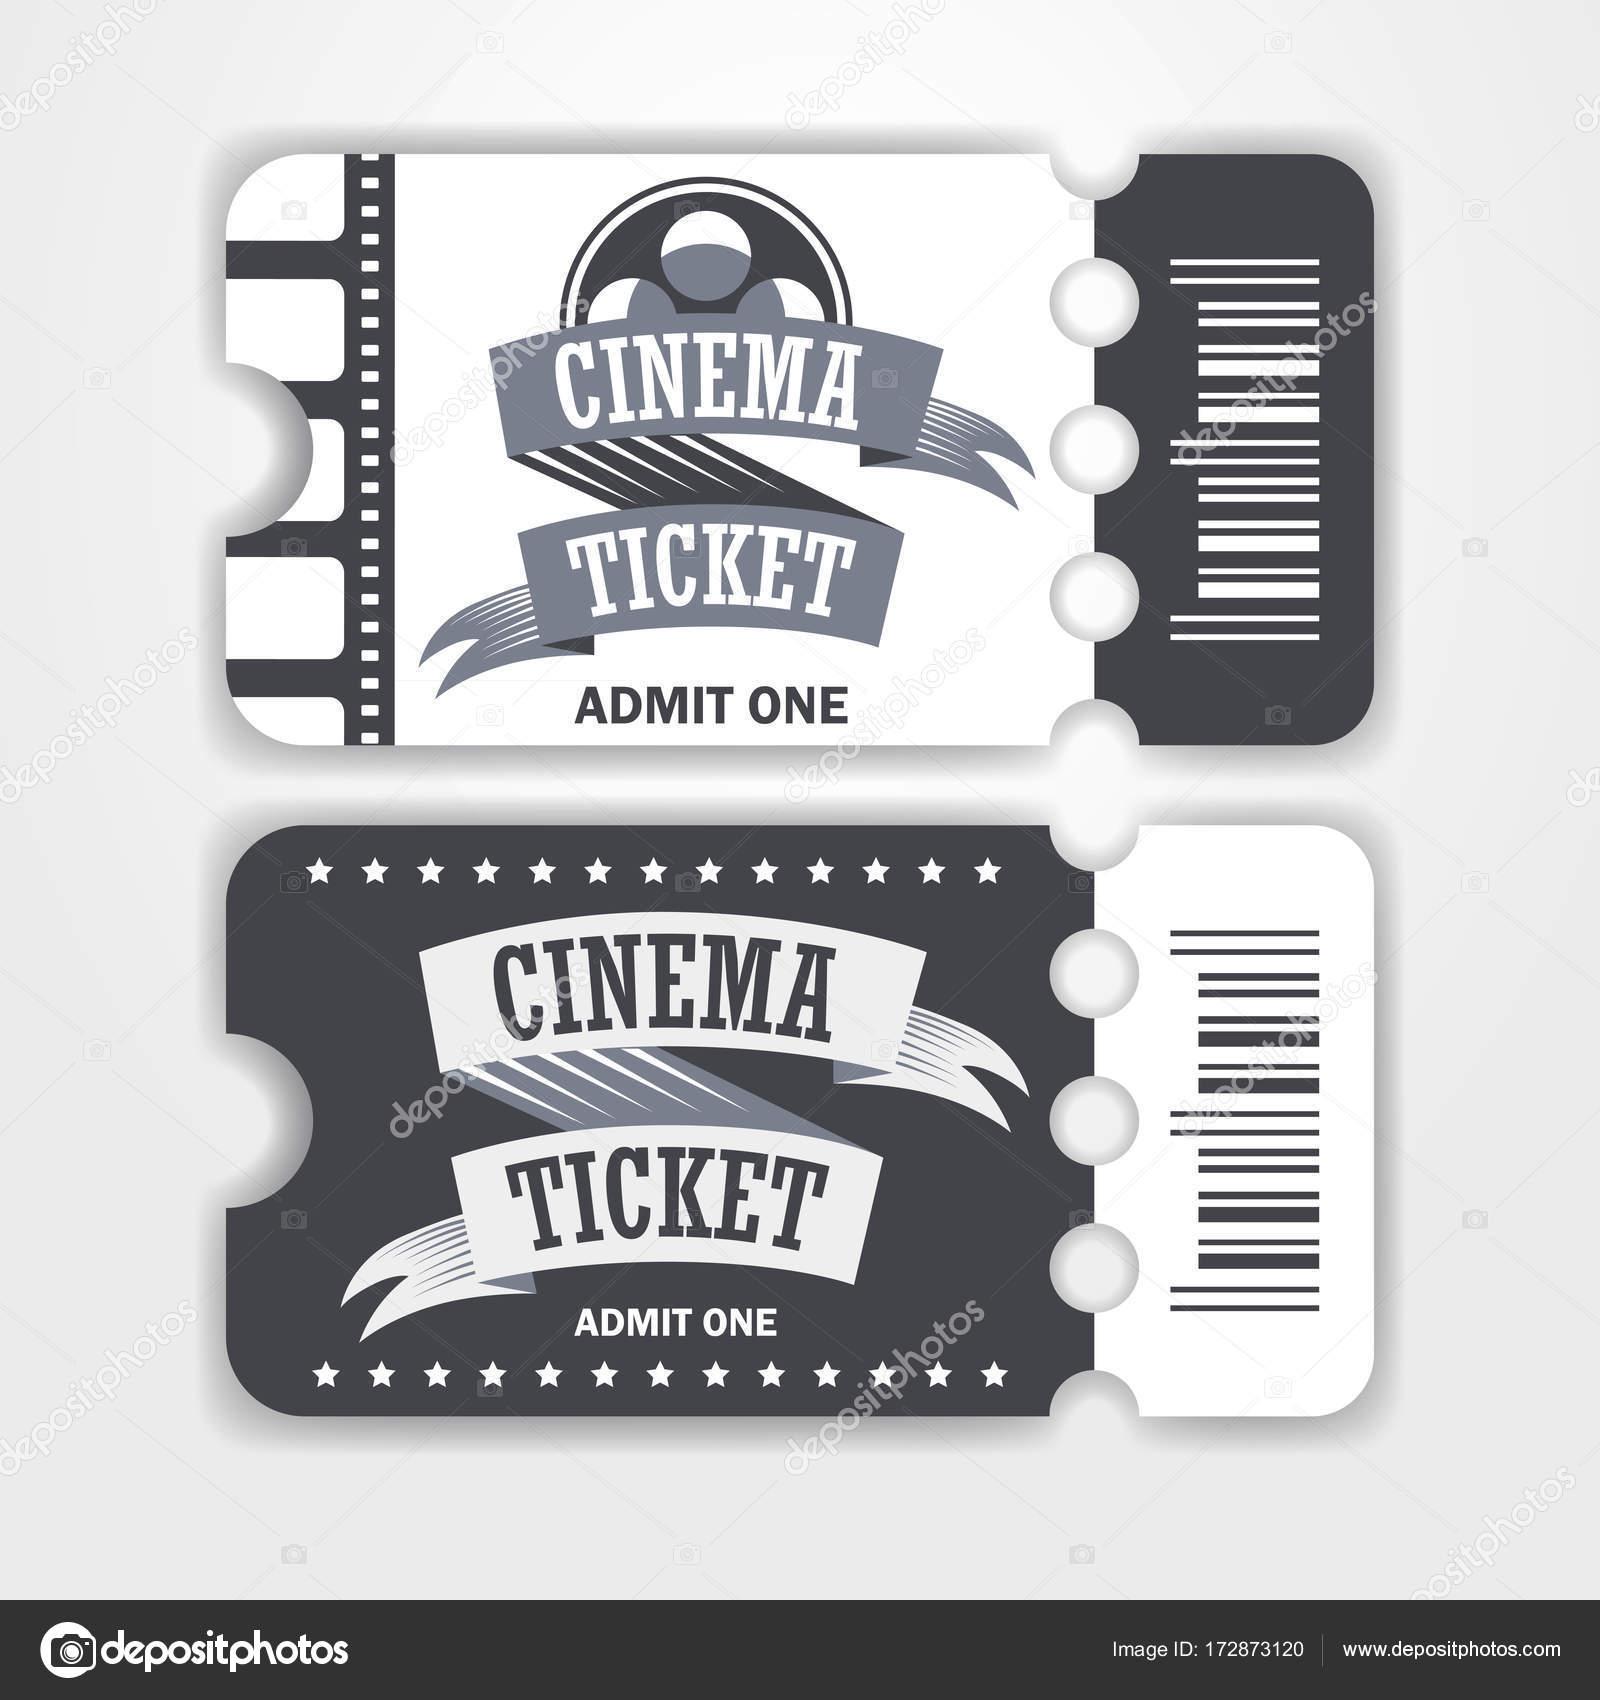 Kino Karten Vorlage — Stockvektor © Scorpion333 #172873120